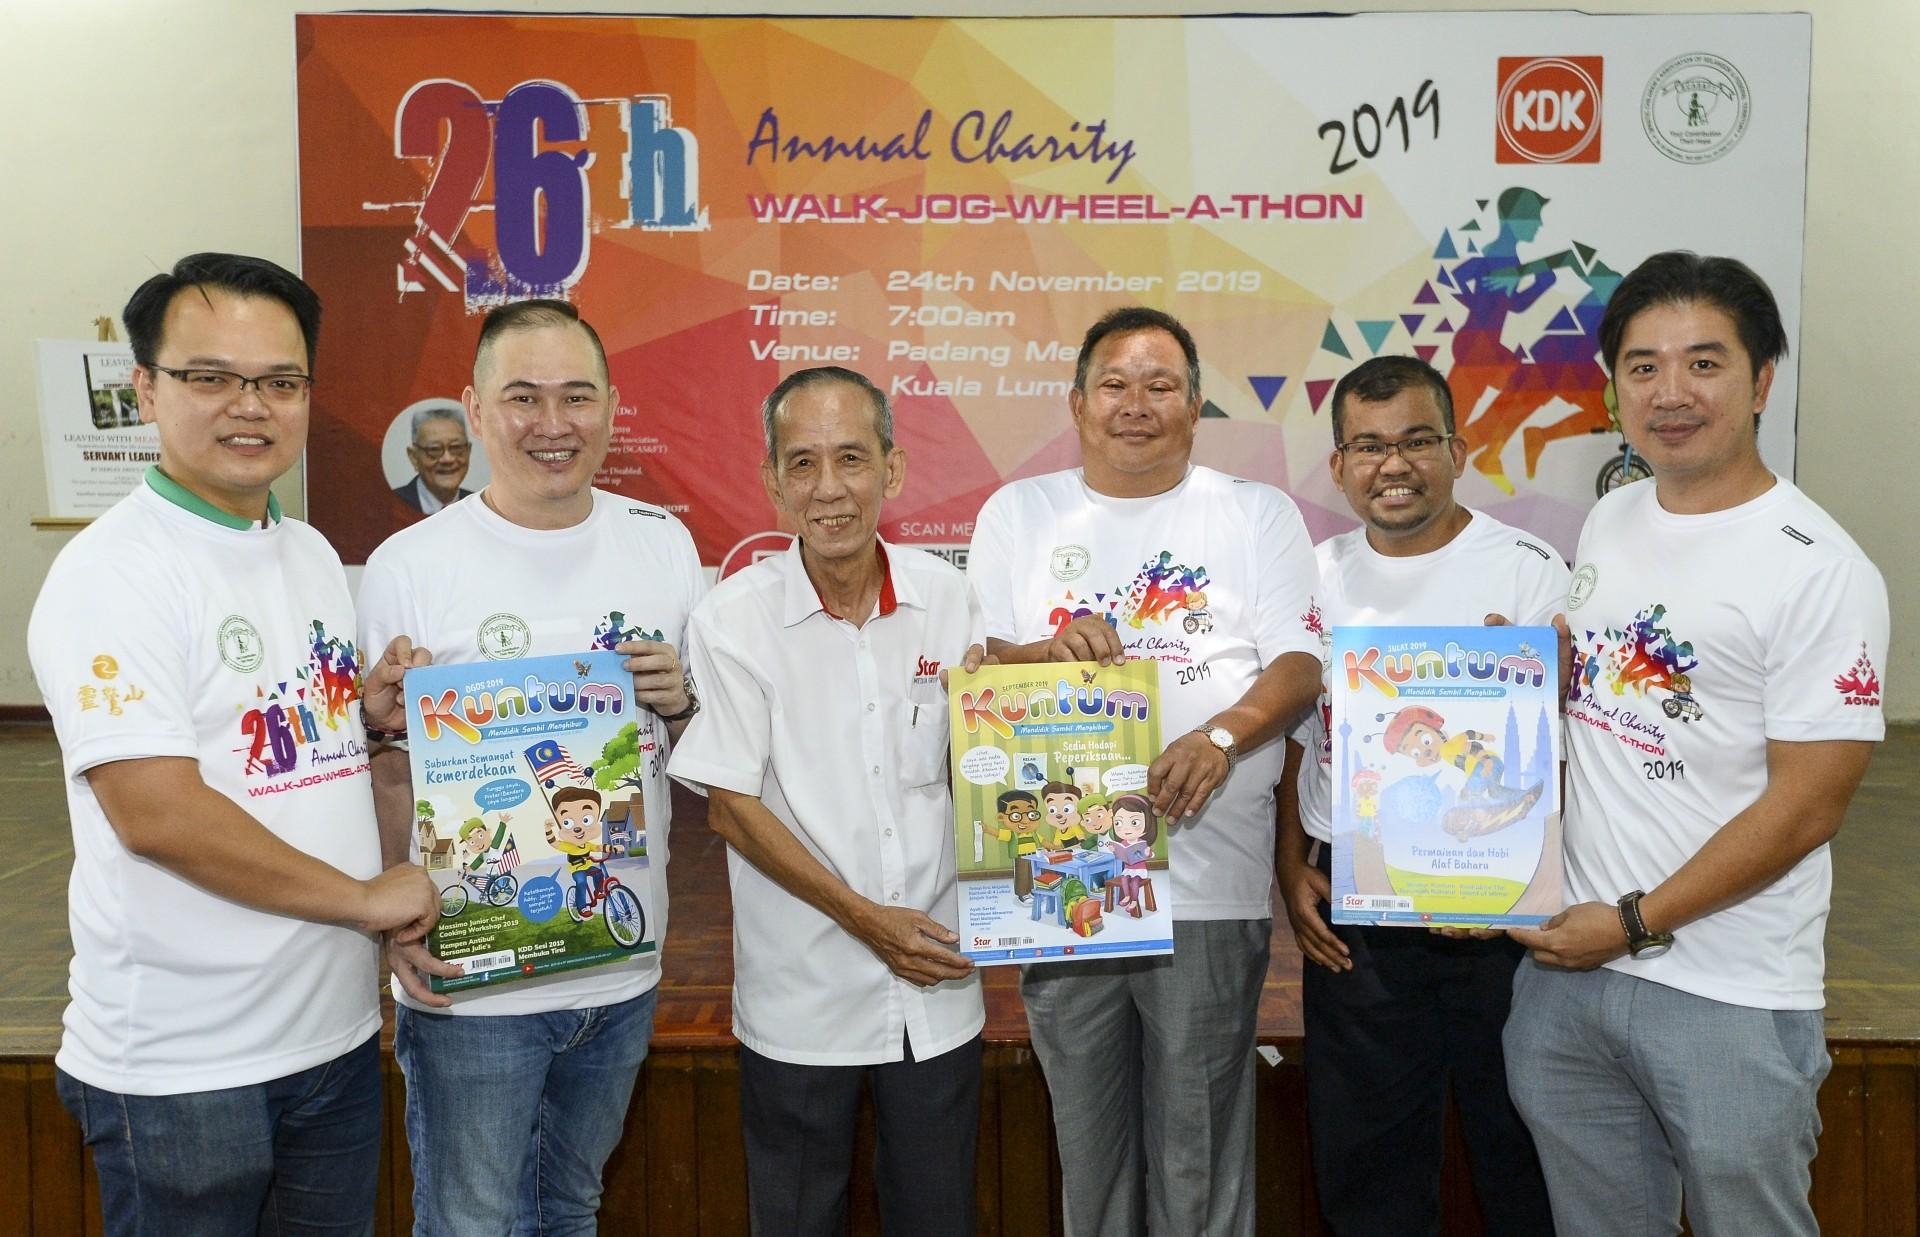 Loo (third from left) handing over Kuntum magazines to the Walk-Jog-Wheel-a-Thon organising committee members.